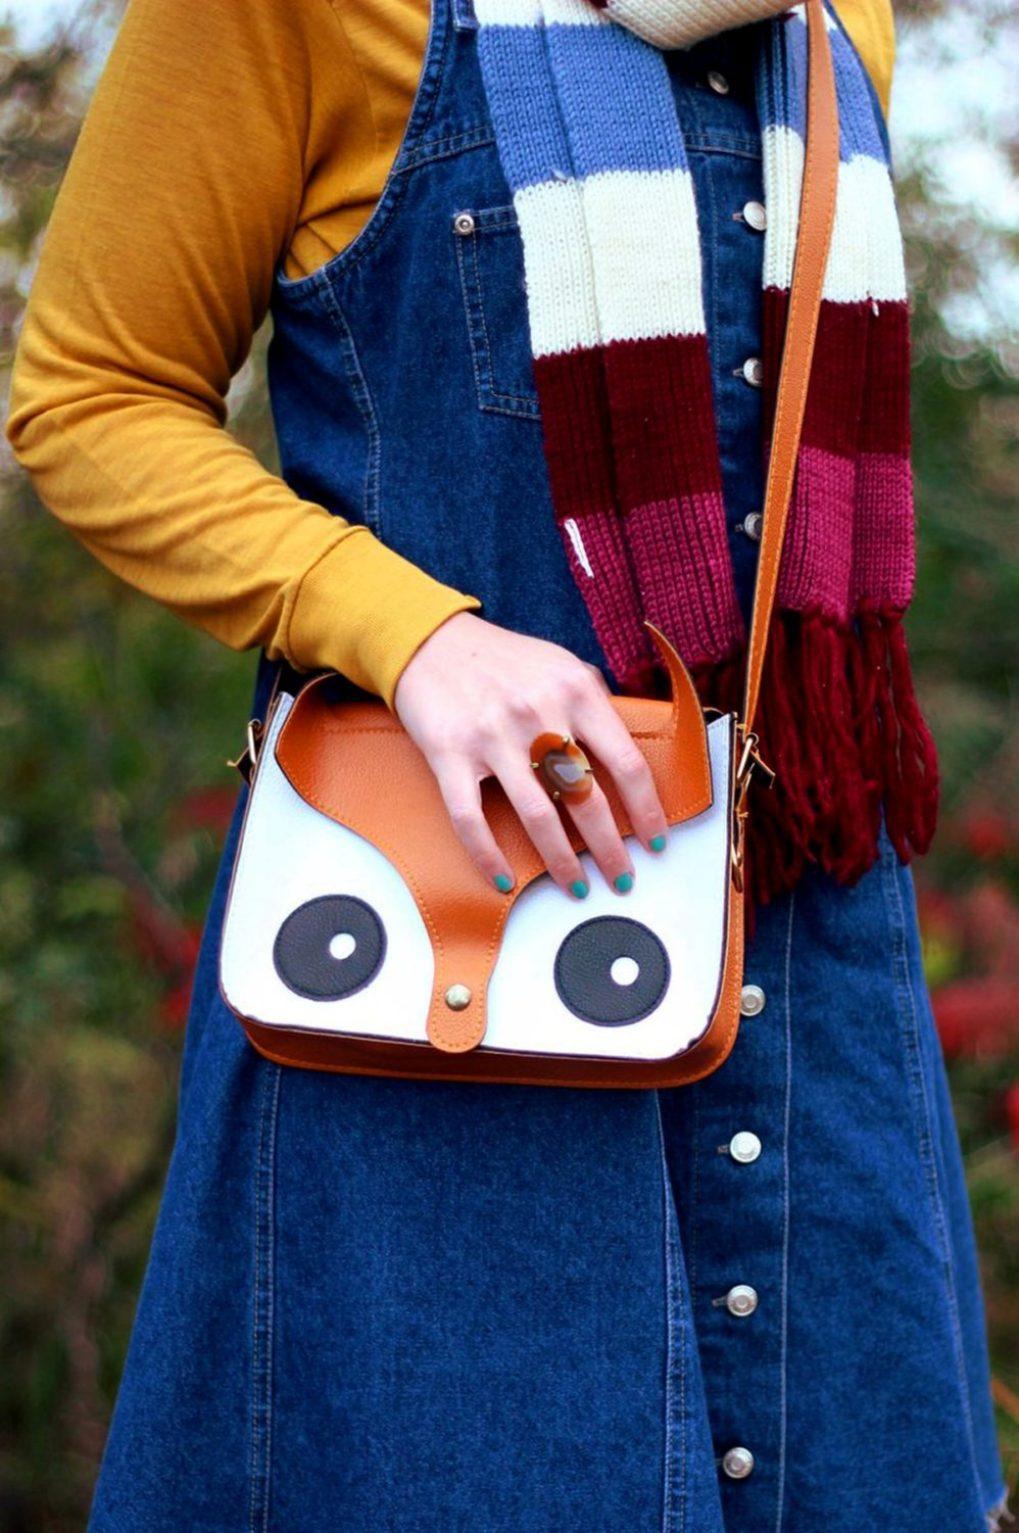 Outfit details: Mustard yellow turtleneck, denim overall dress, multi-colored striped scarf, orange fox handbag